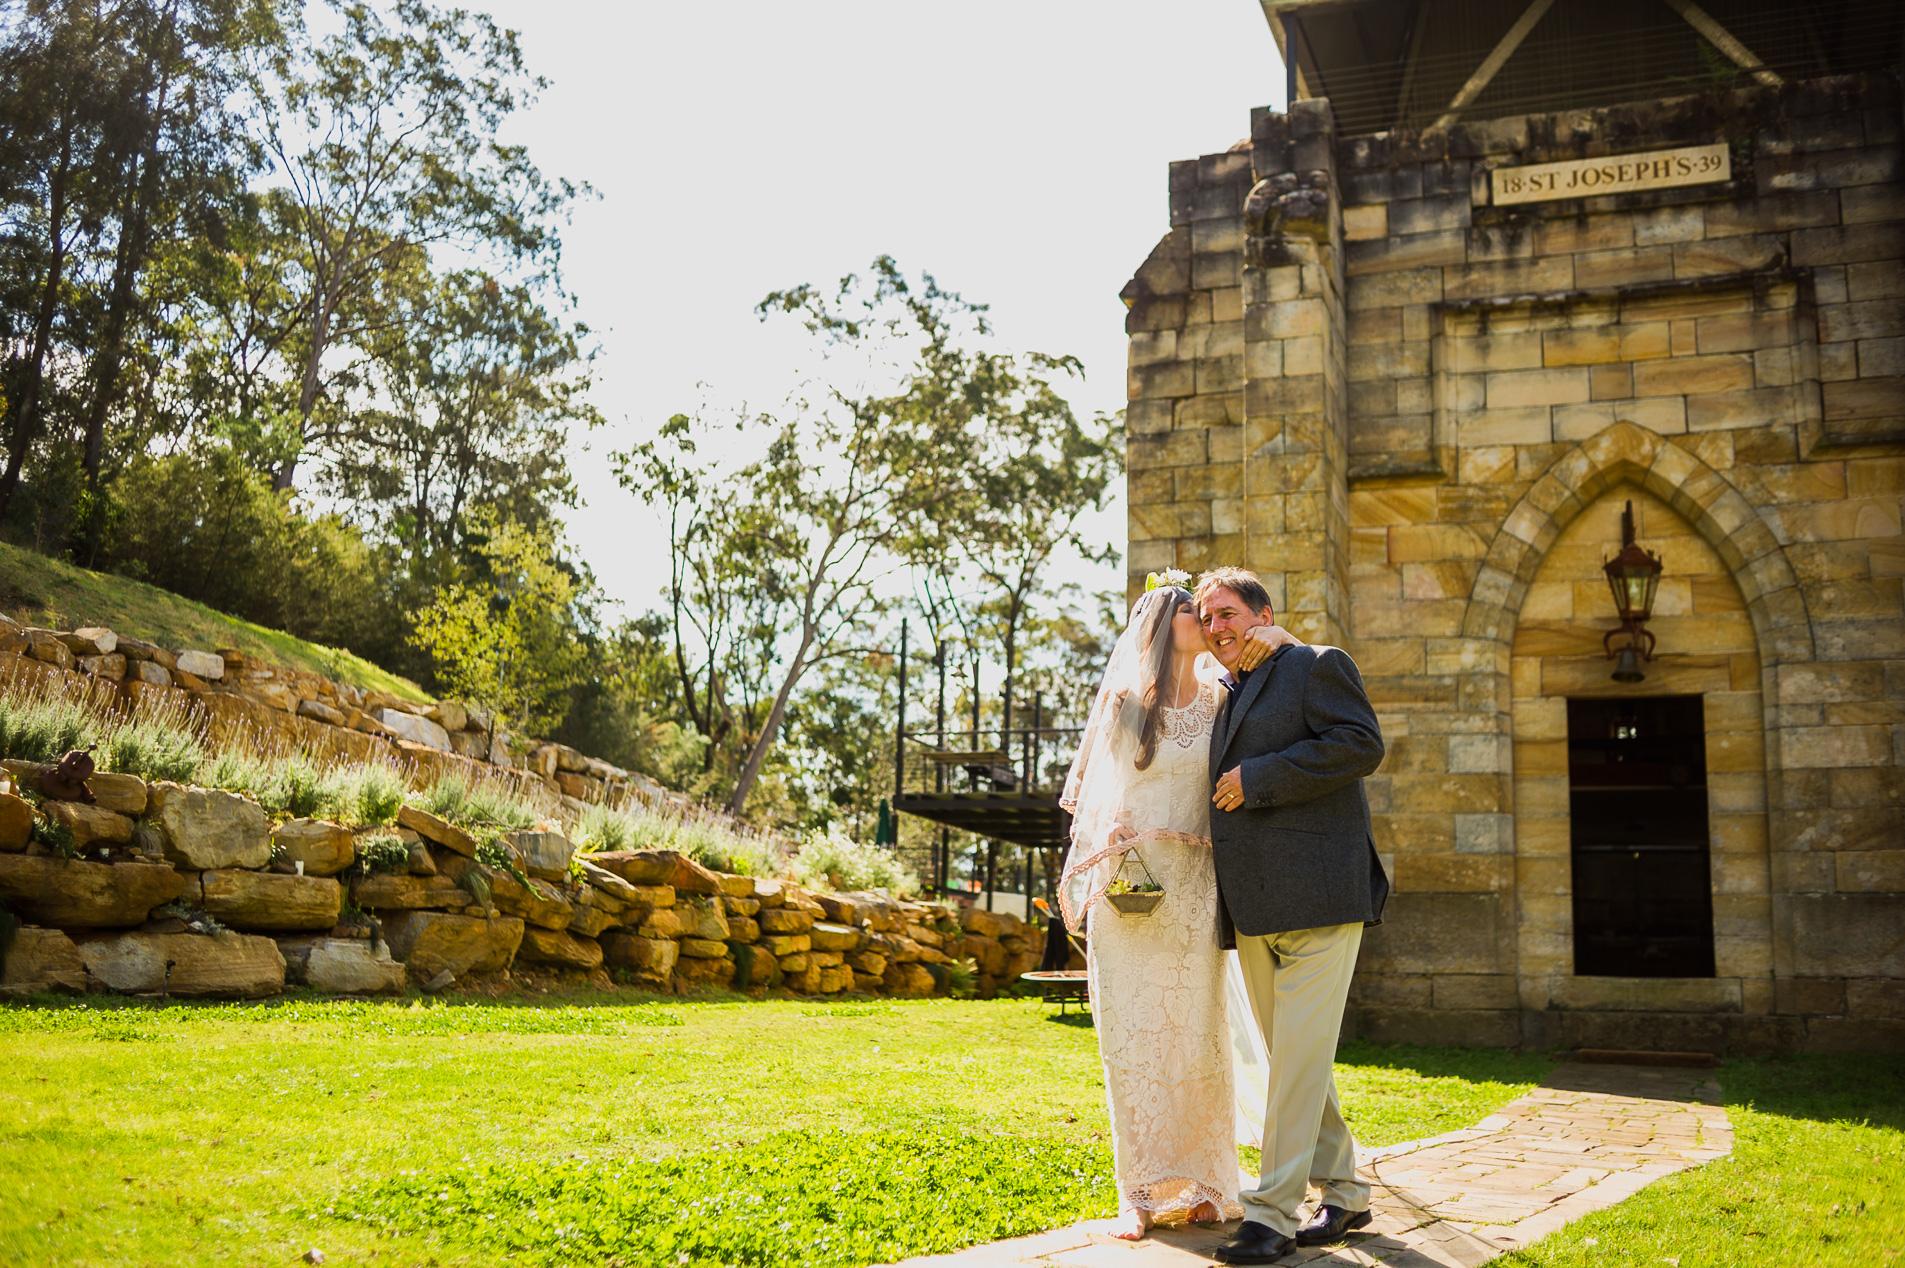 Rachel-gonzalo-wedding-sydney-22